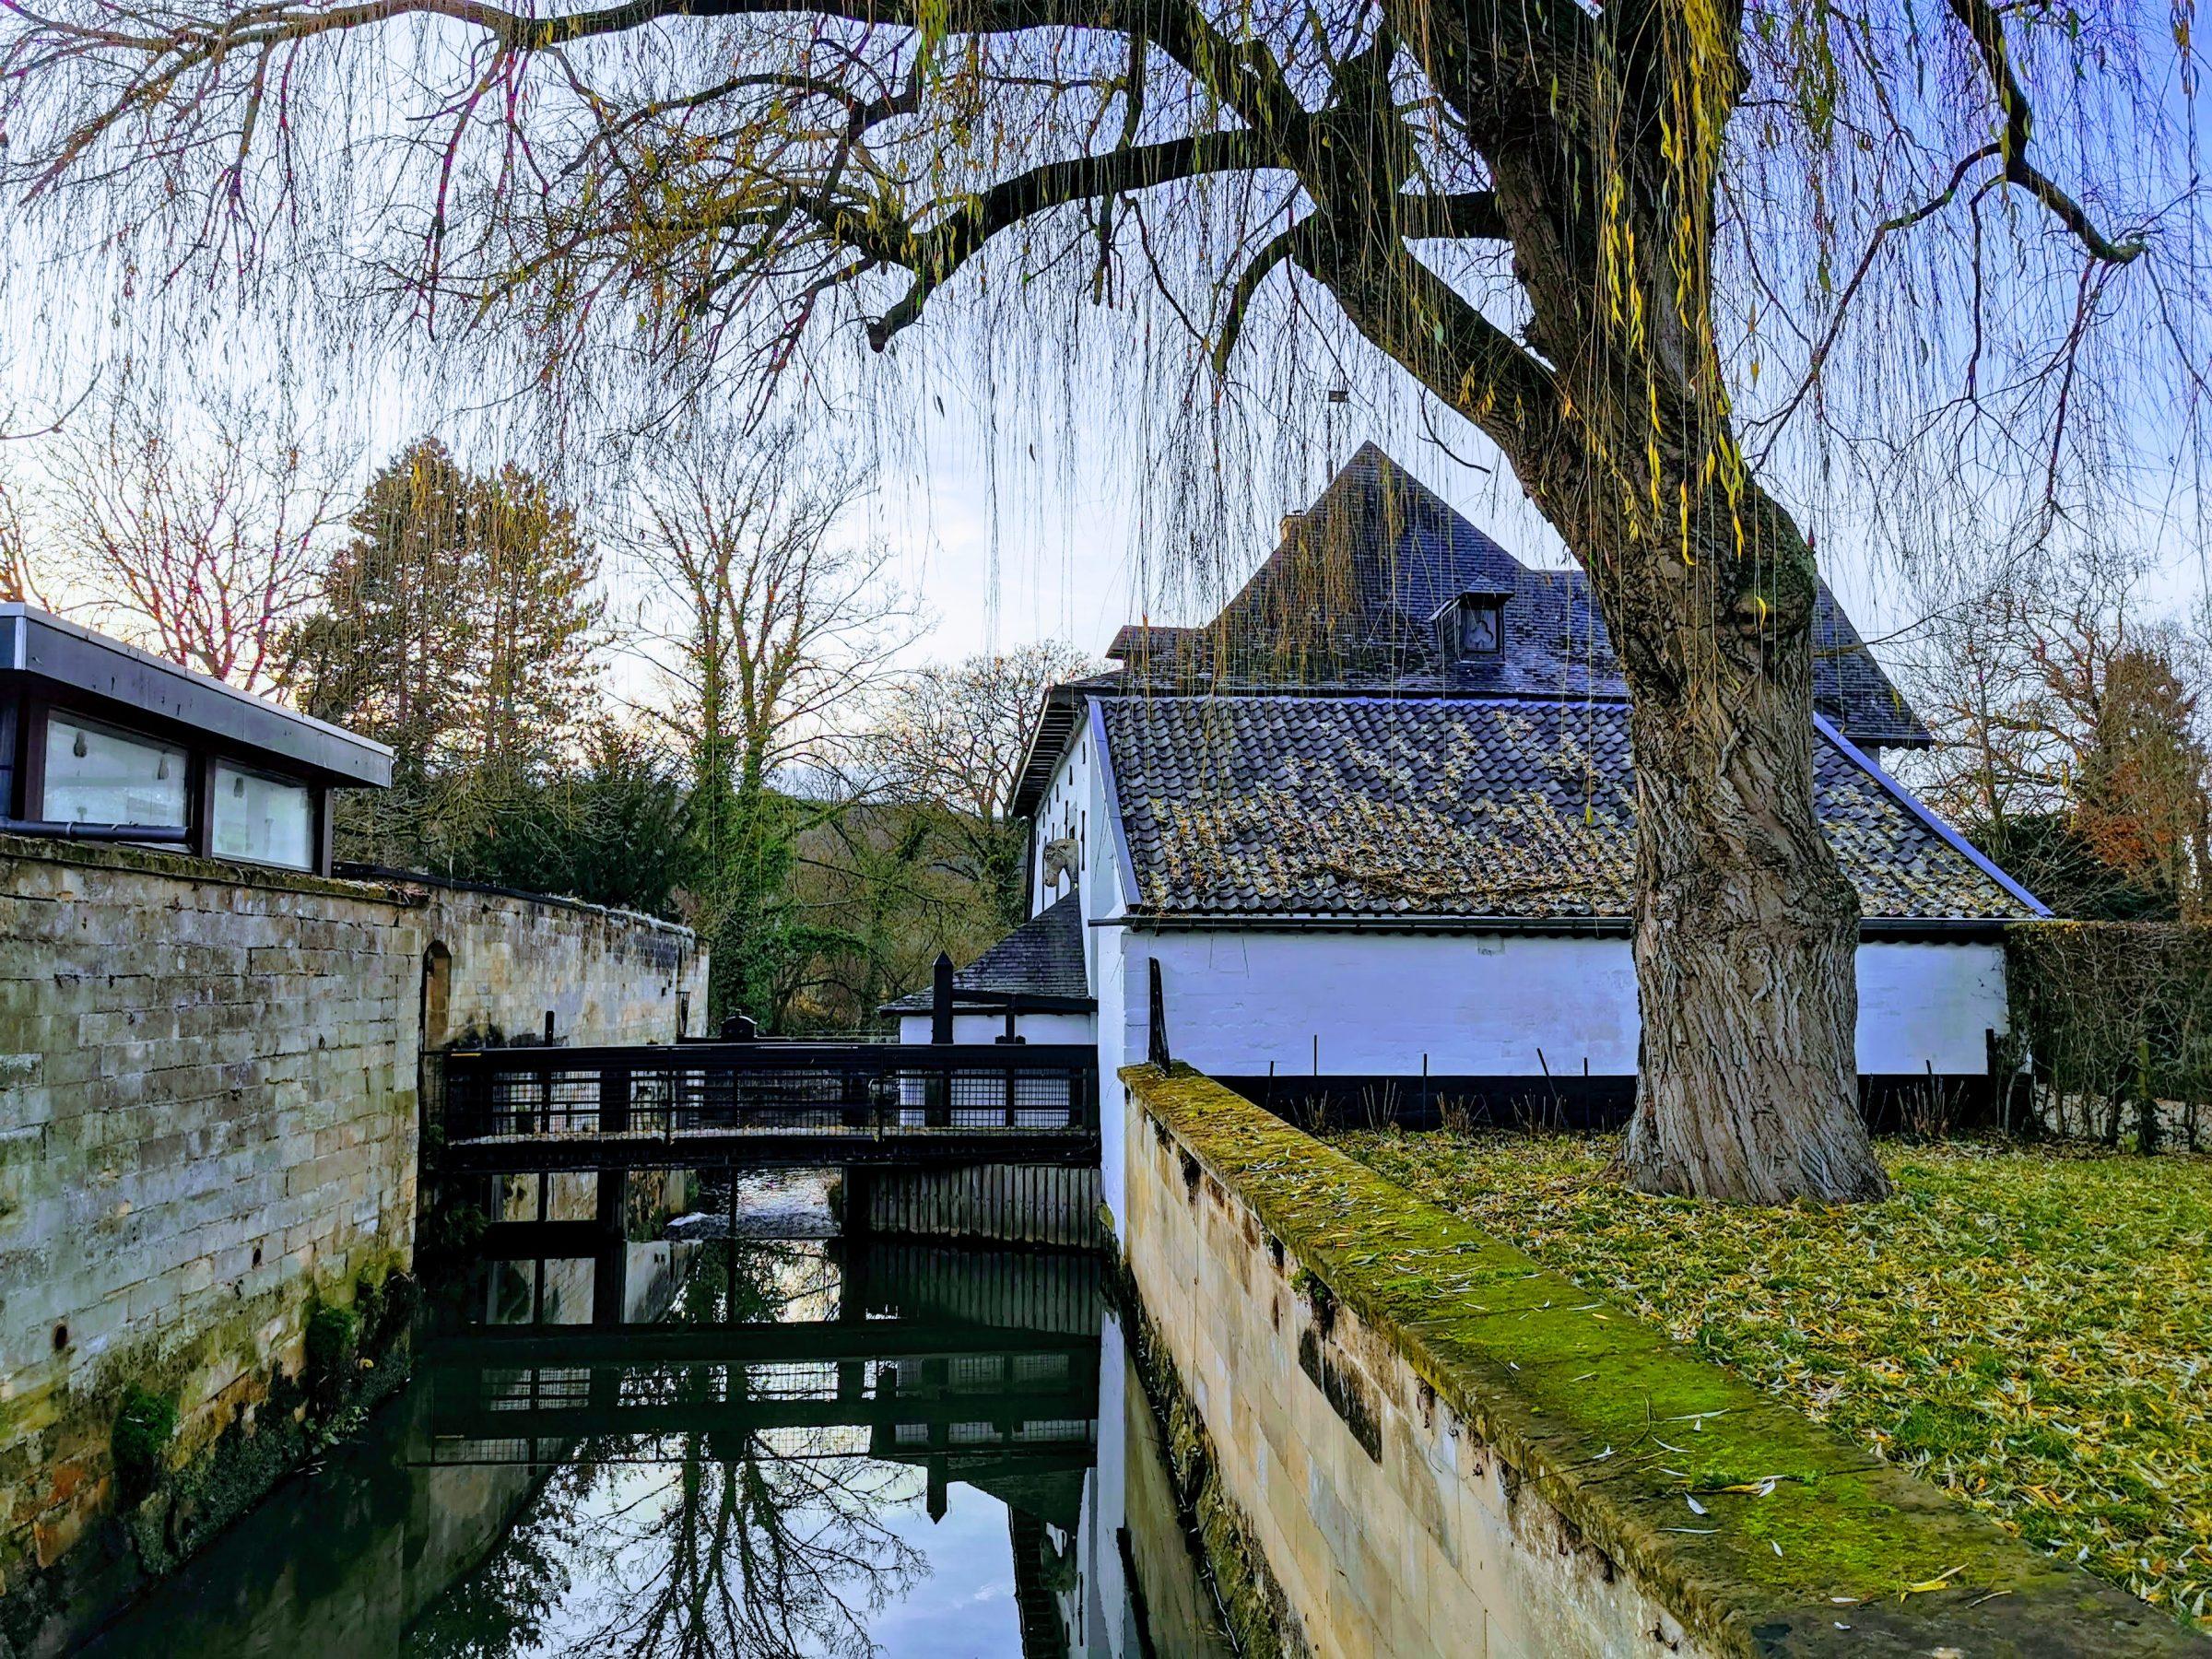 Schaloensmolen - Wandelroute oud-Valkenburg